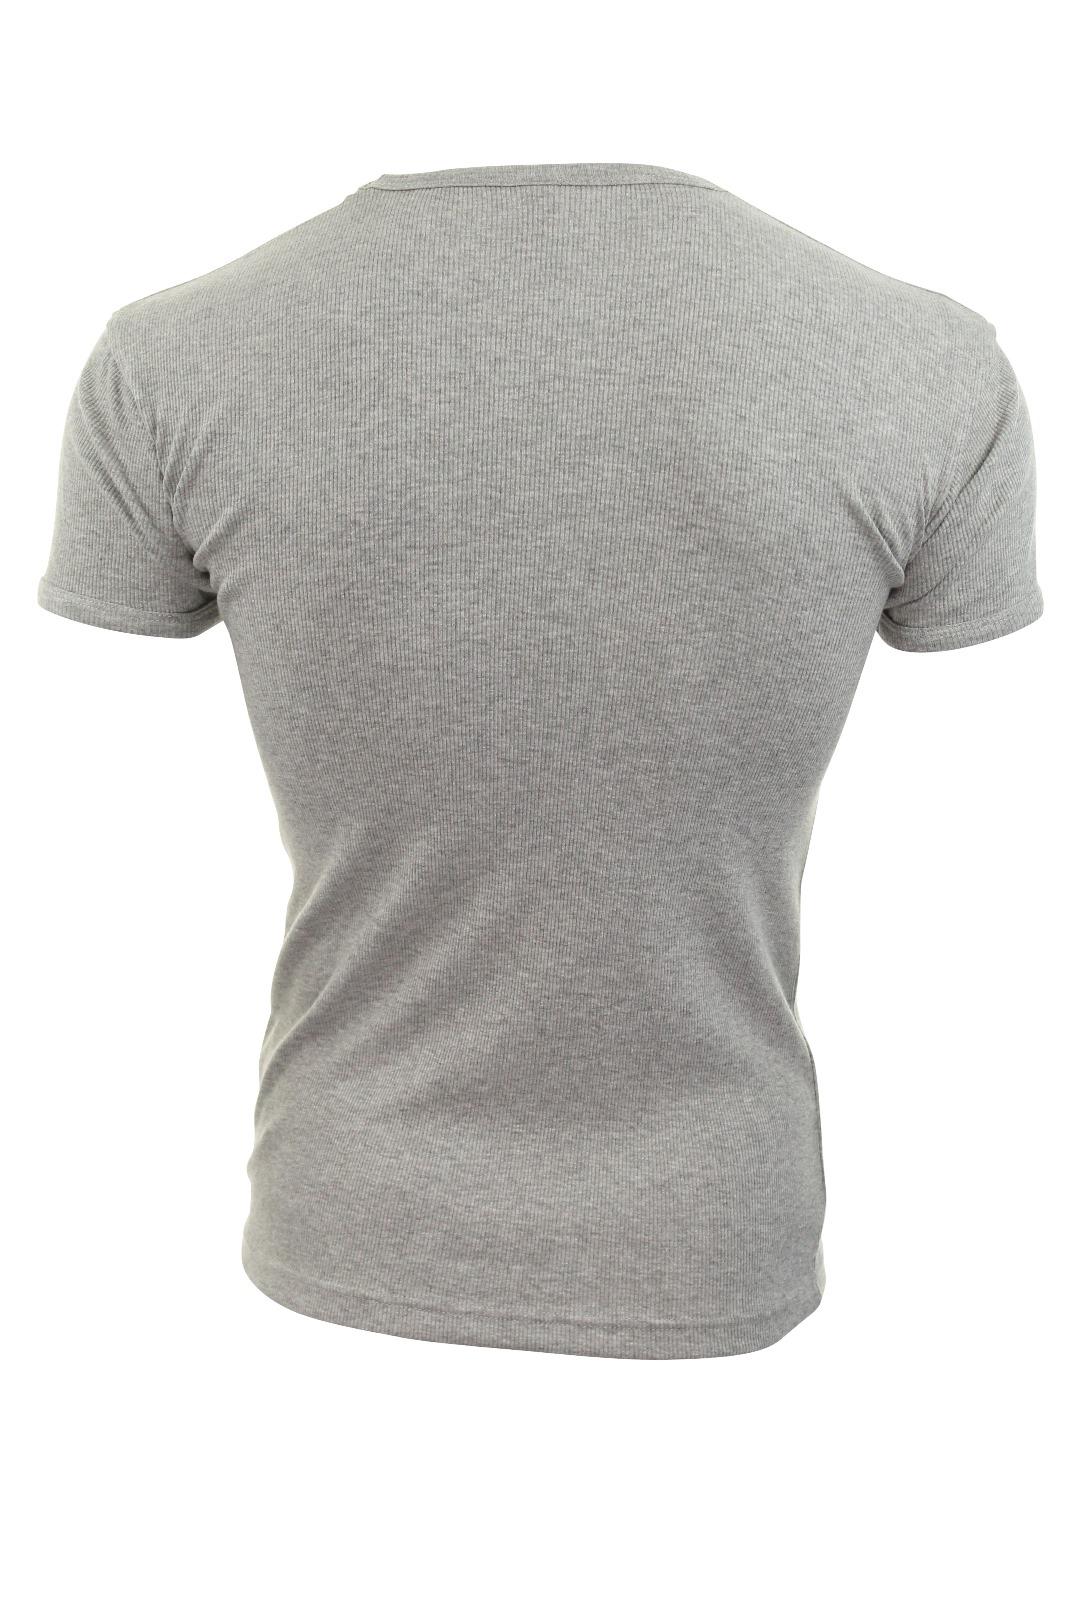 Mens Rib T-Shirt Ribbed Crew /& Vee Neck Soul Star Plain Slim Fit Jersey